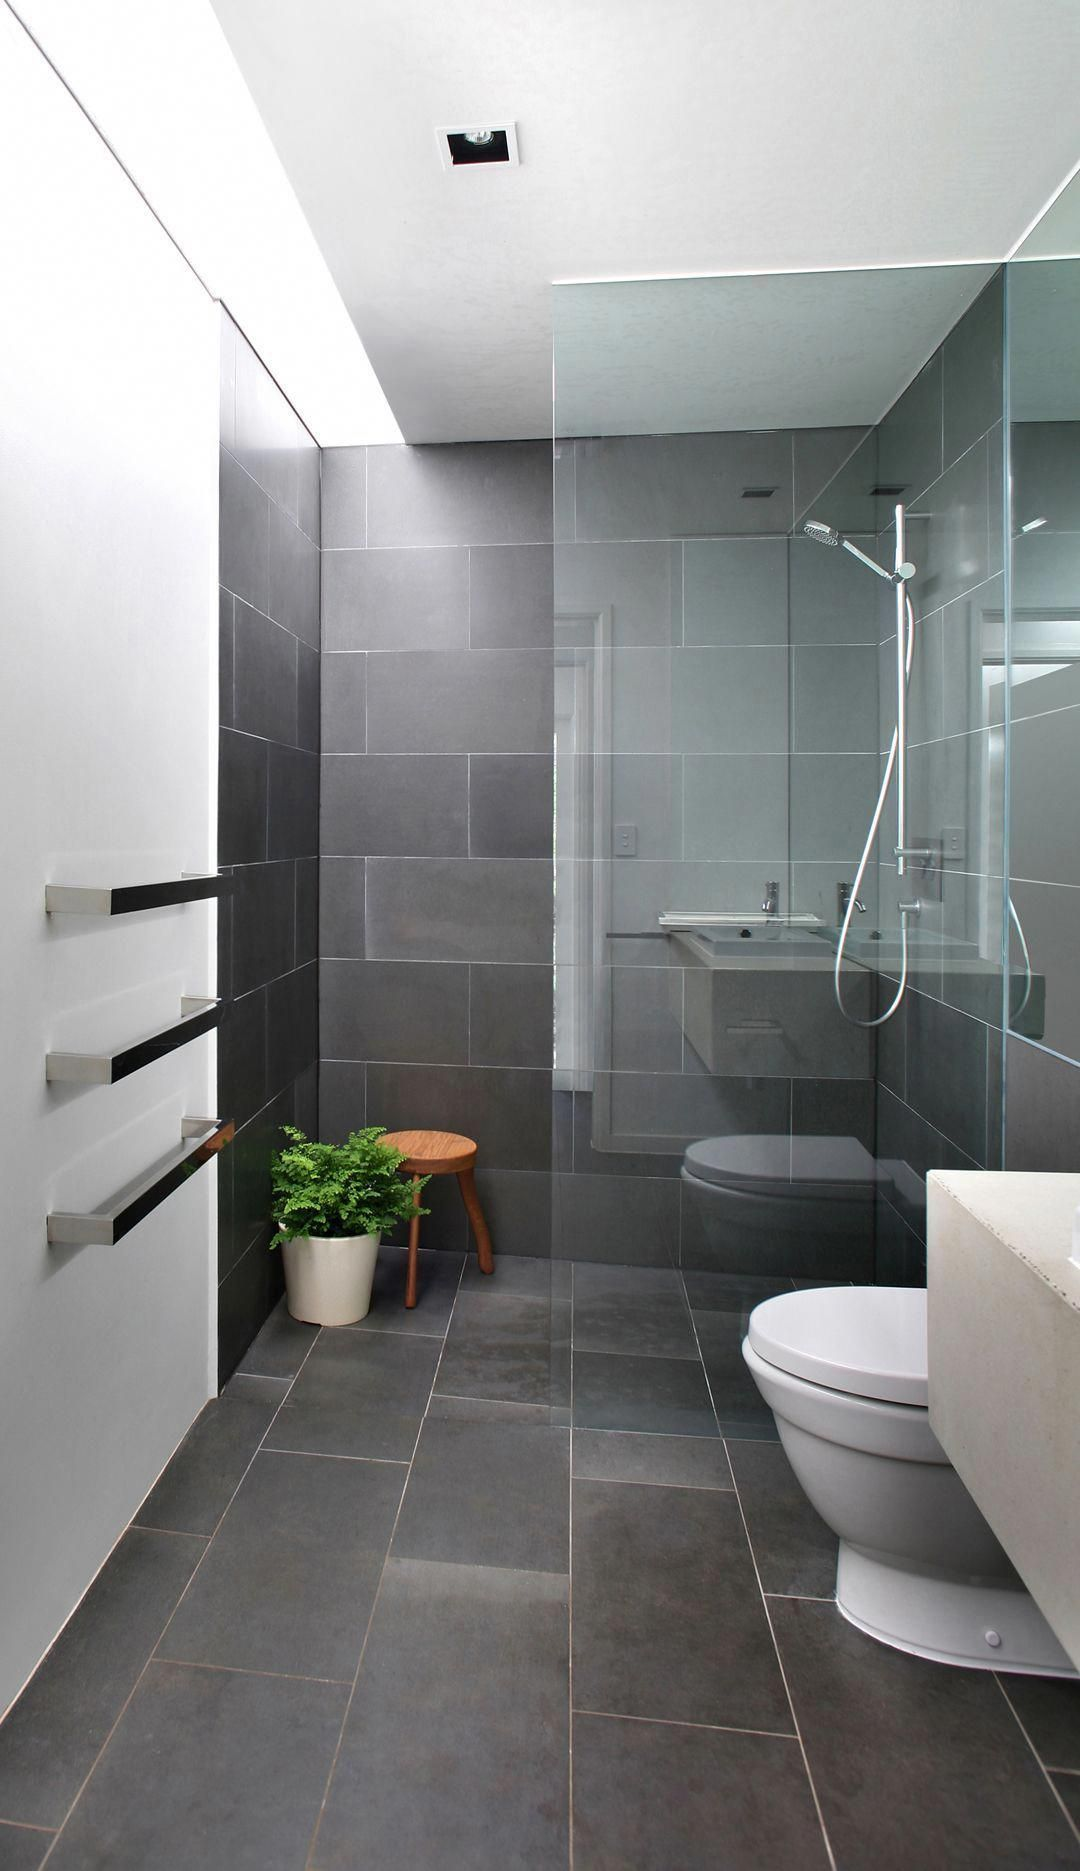 Pin Von Tiana Ramanandraibe Auf Salle De Bain Badezimmerideen Badezimmer Modernes Badezimmerdesign